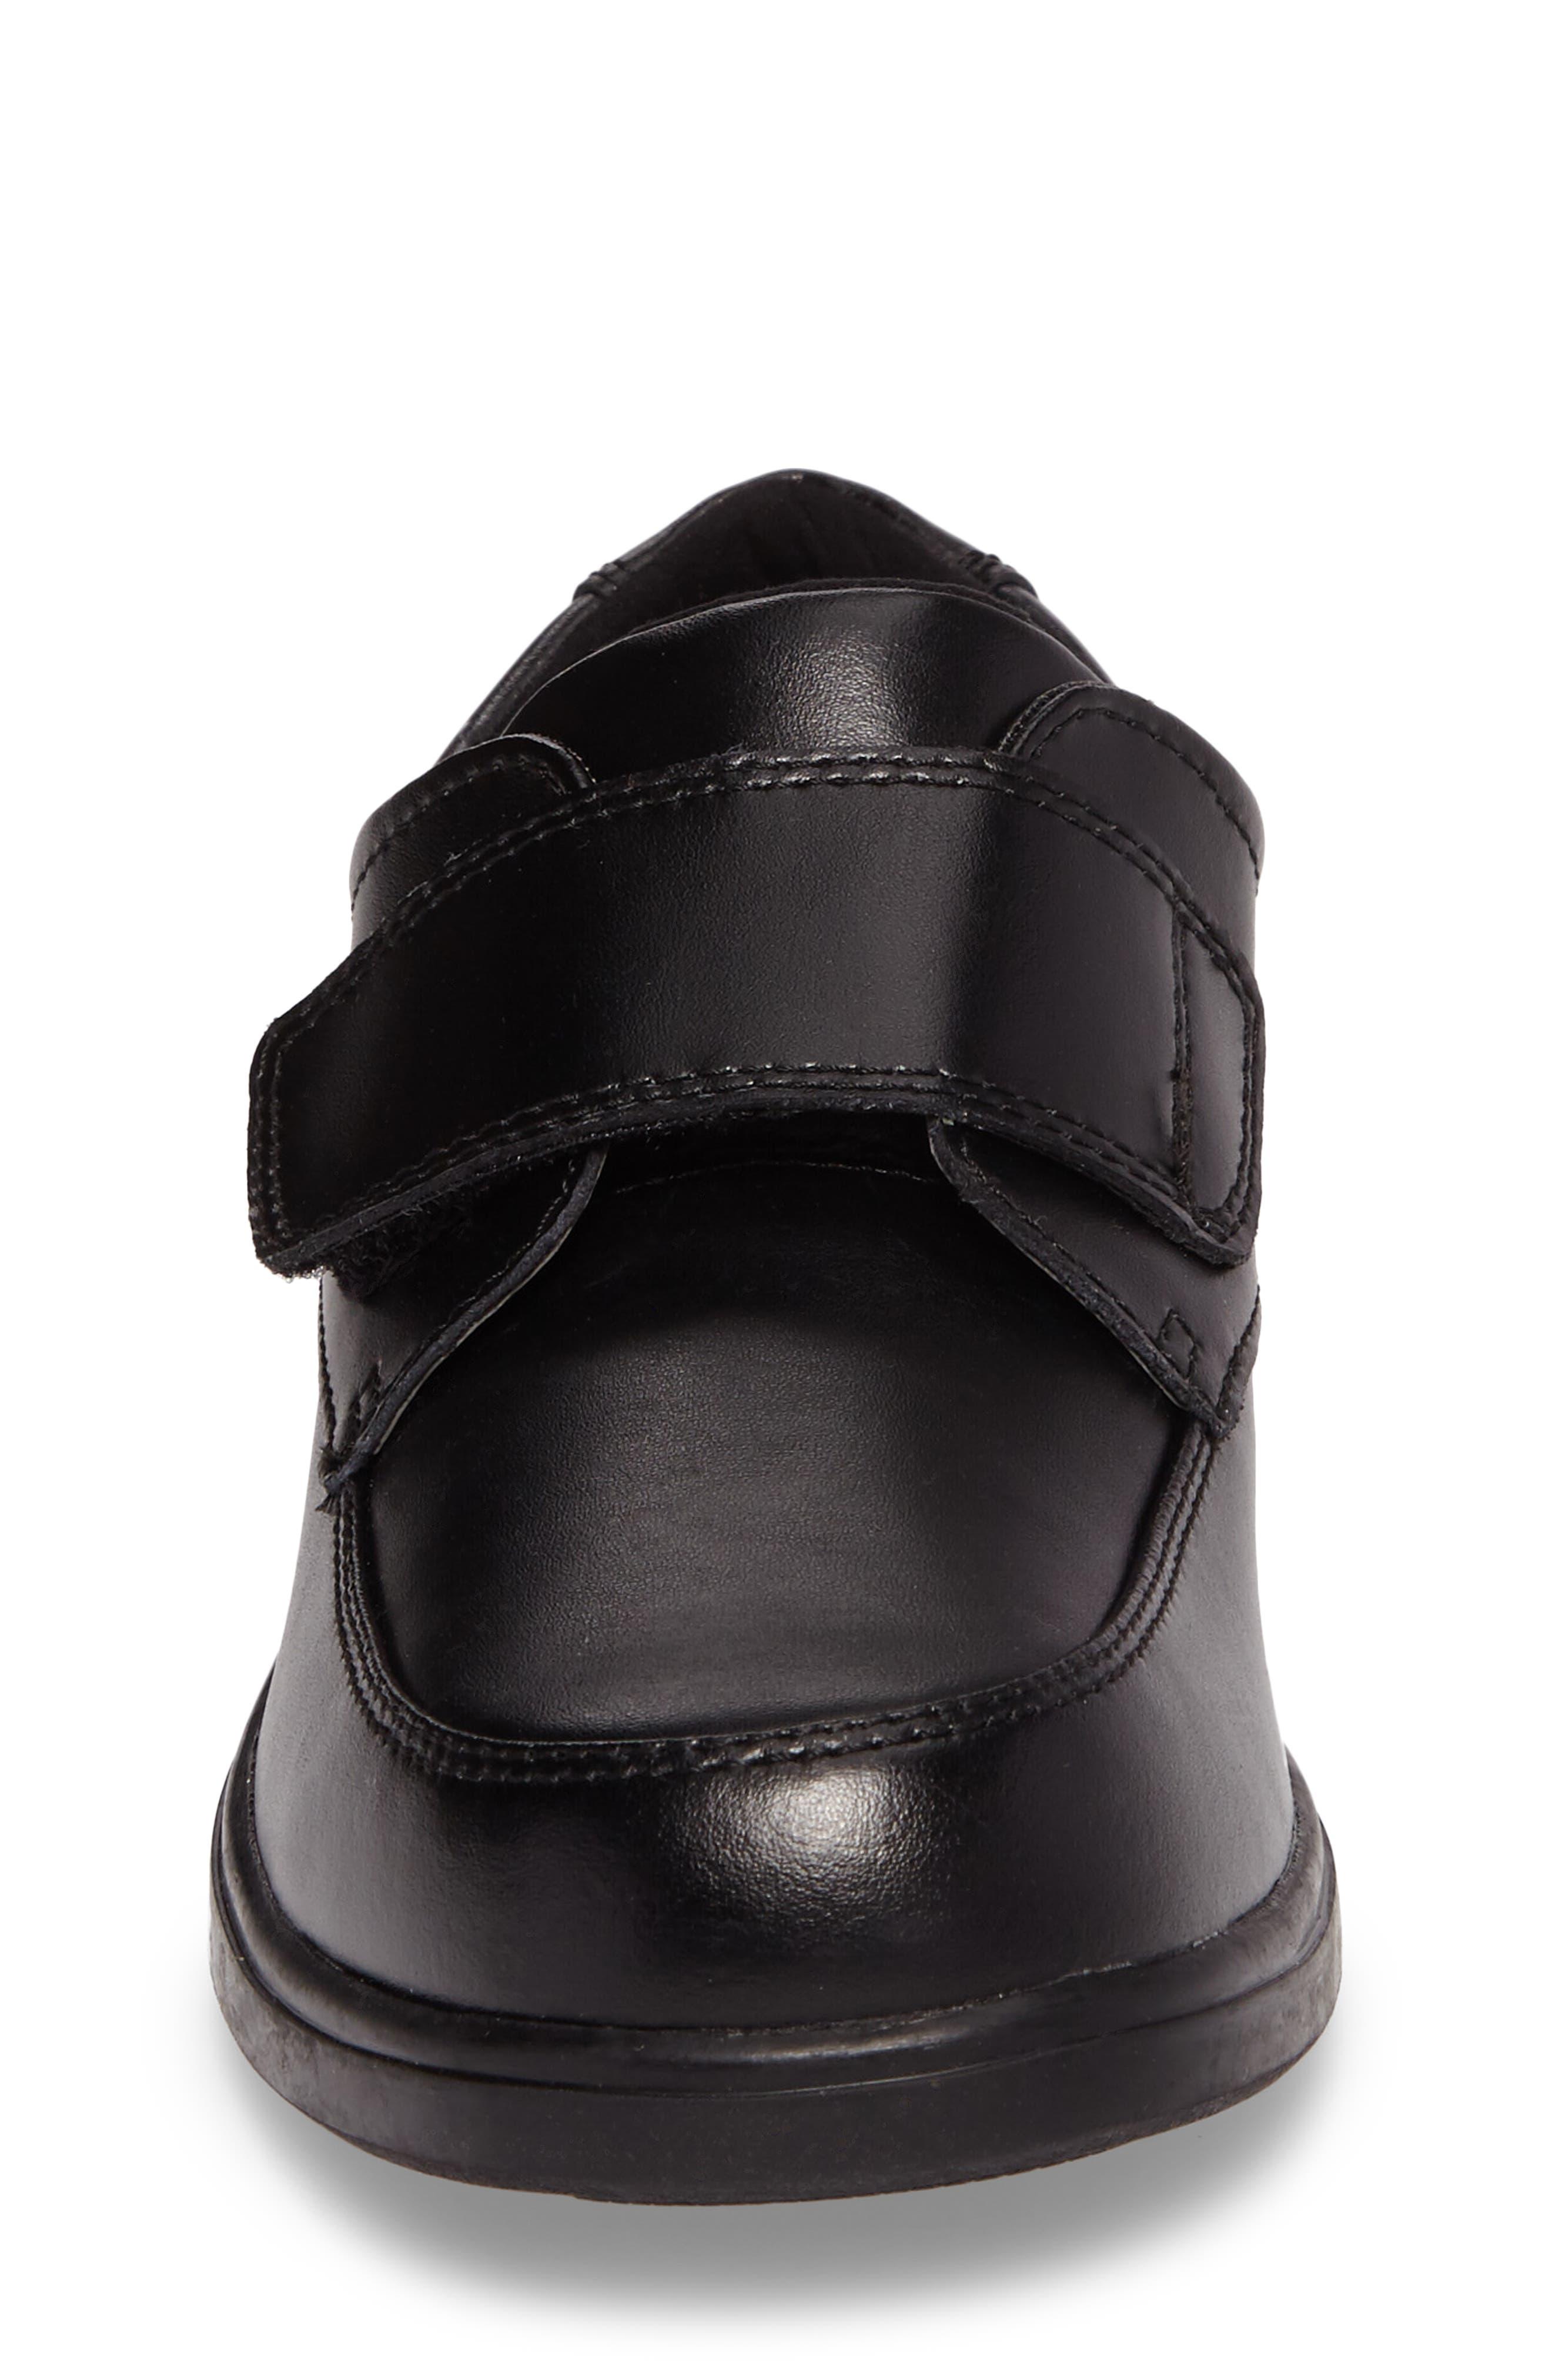 Hush Puppies Gavin Front Strap Dress Shoe,                             Alternate thumbnail 4, color,                             Black Leather